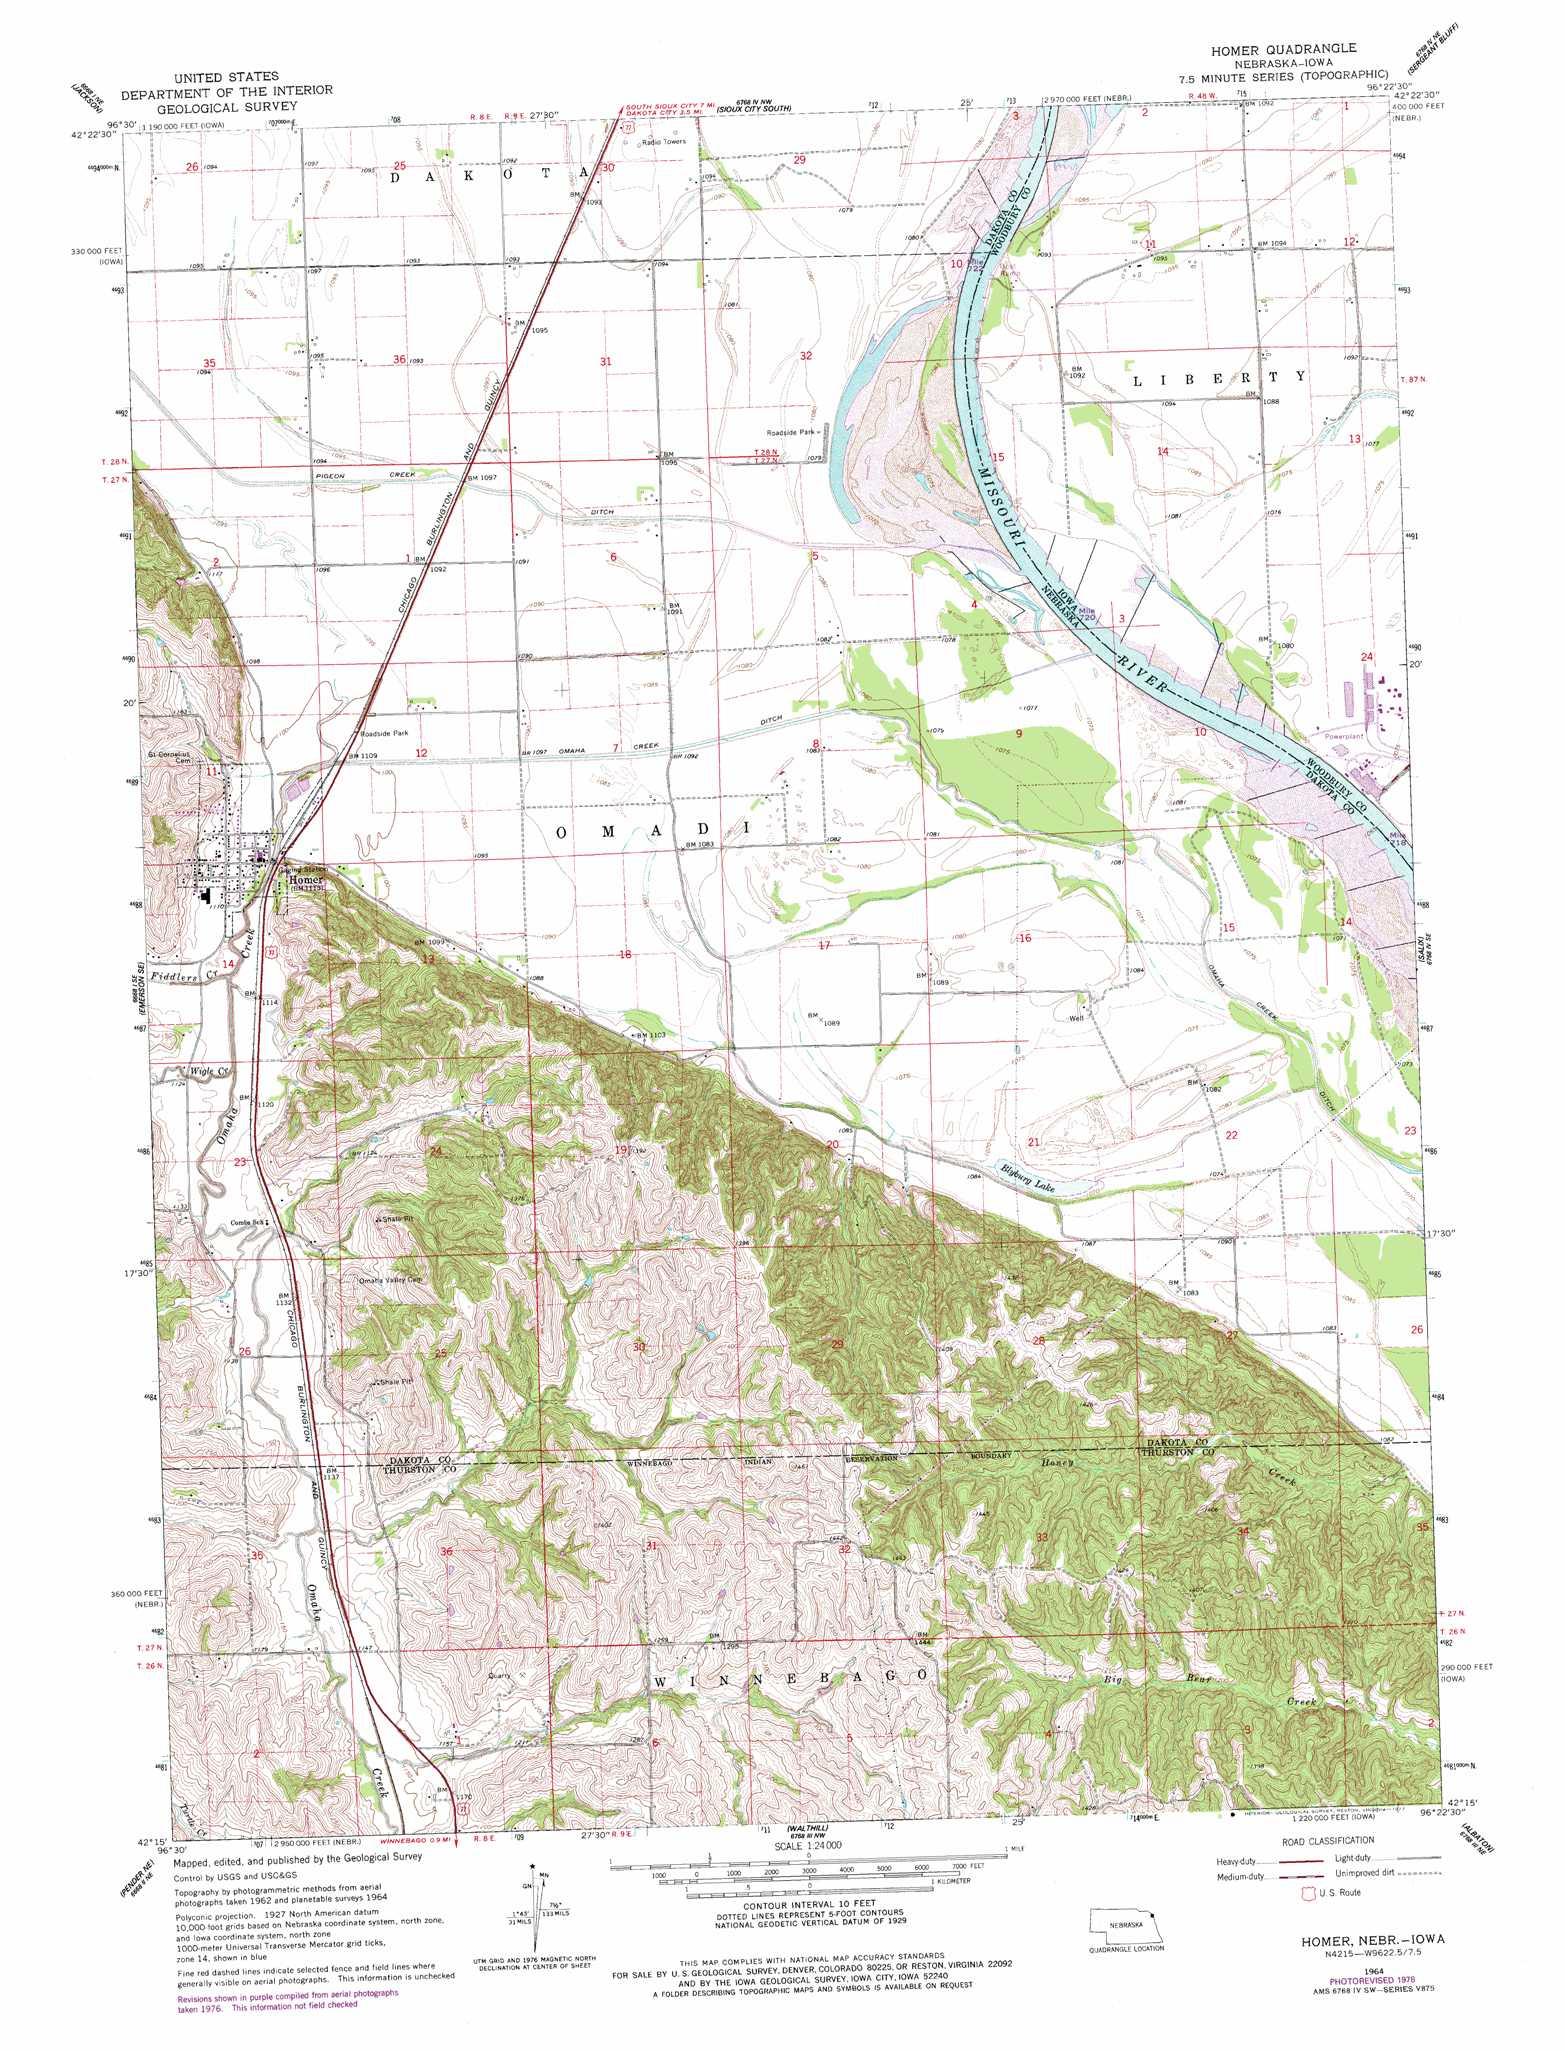 Homer topographic map, NE, IA - USGS Topo Quad 42096c4